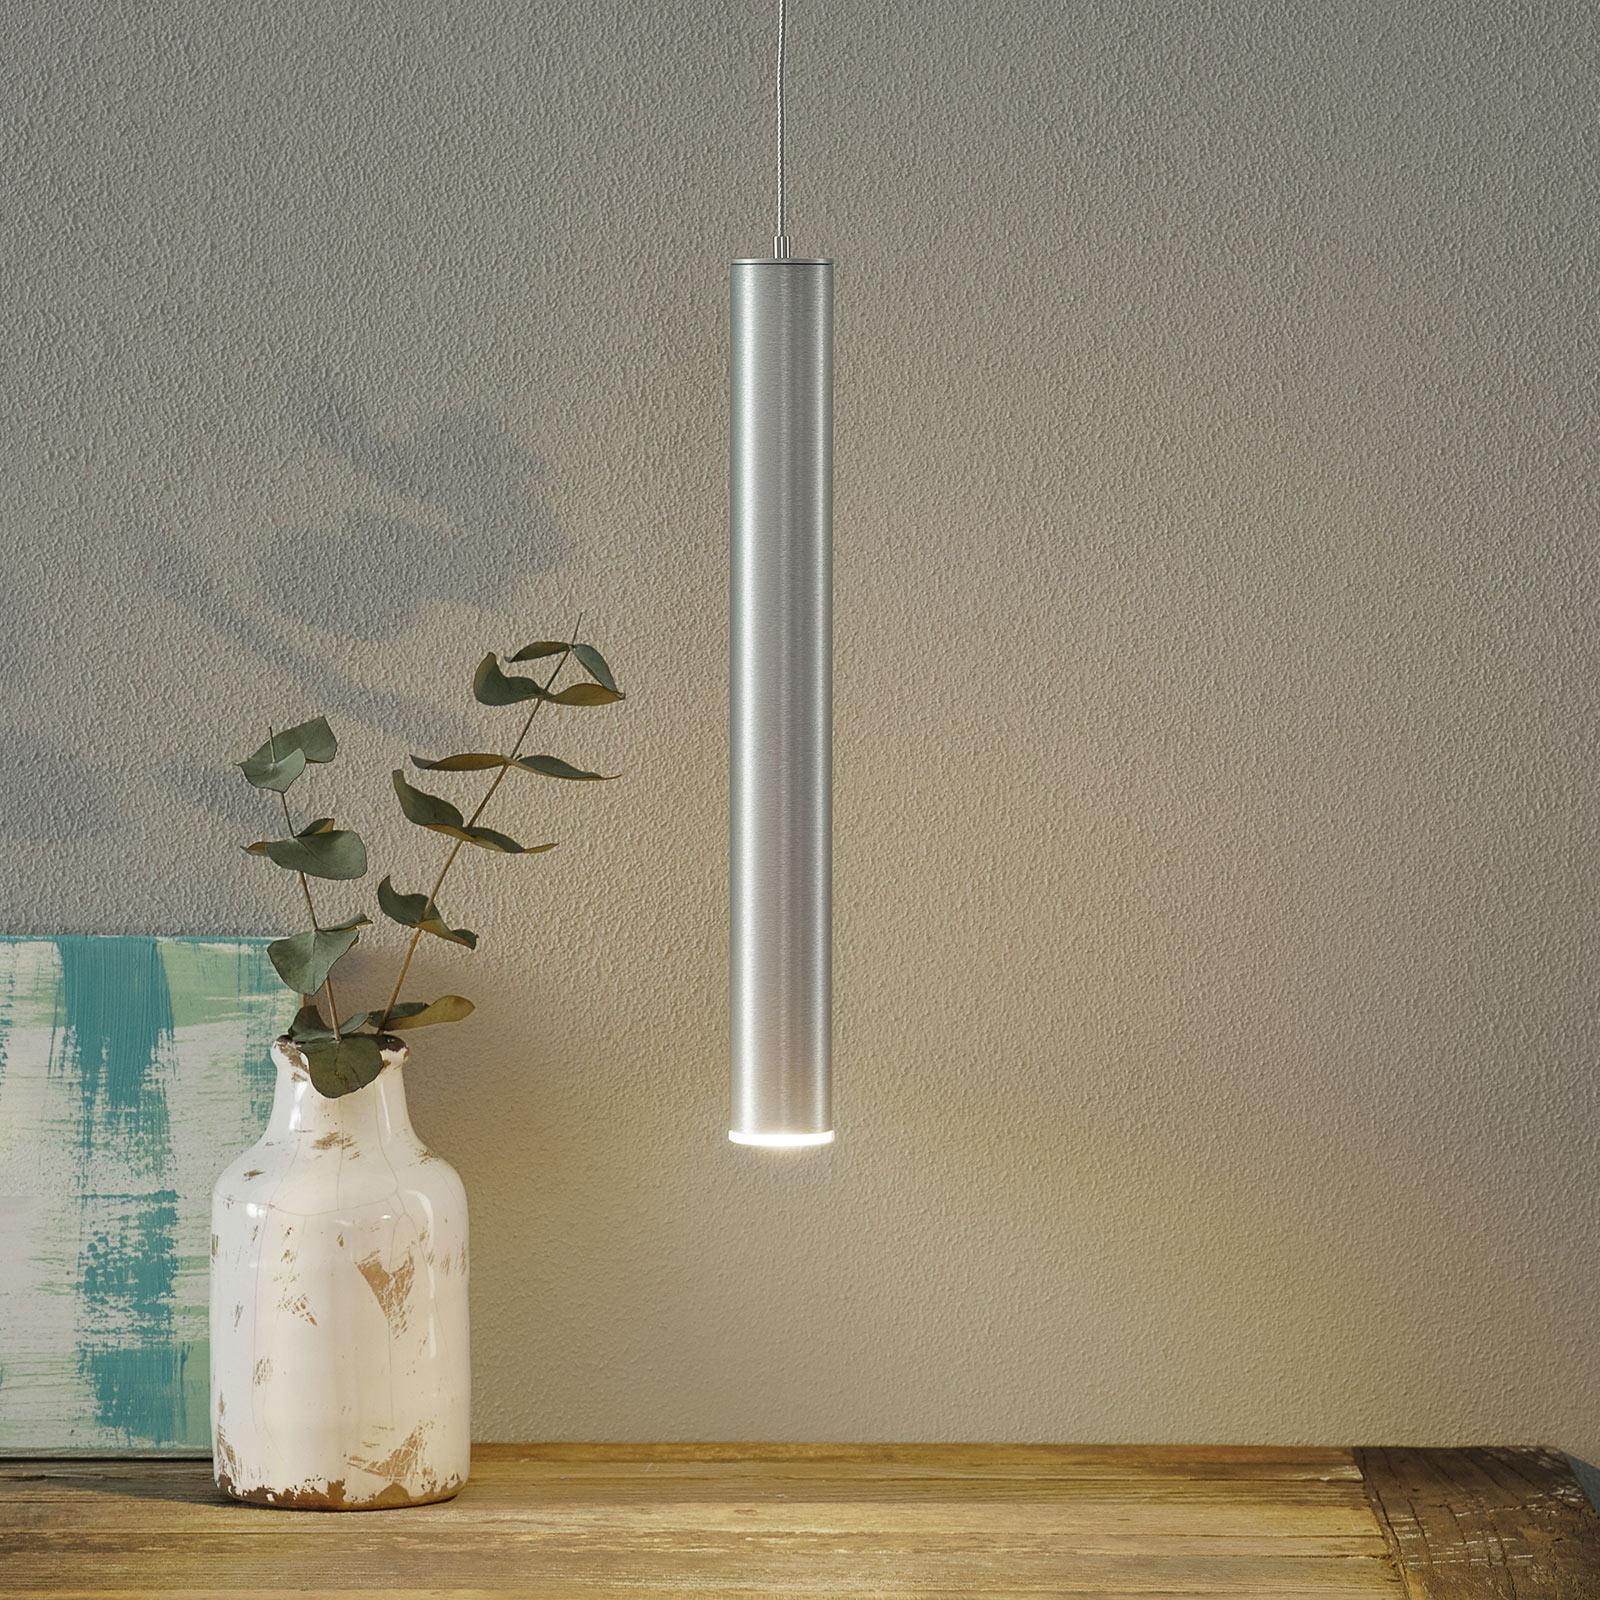 Lámpara colgante LED Plus de altura ajustable